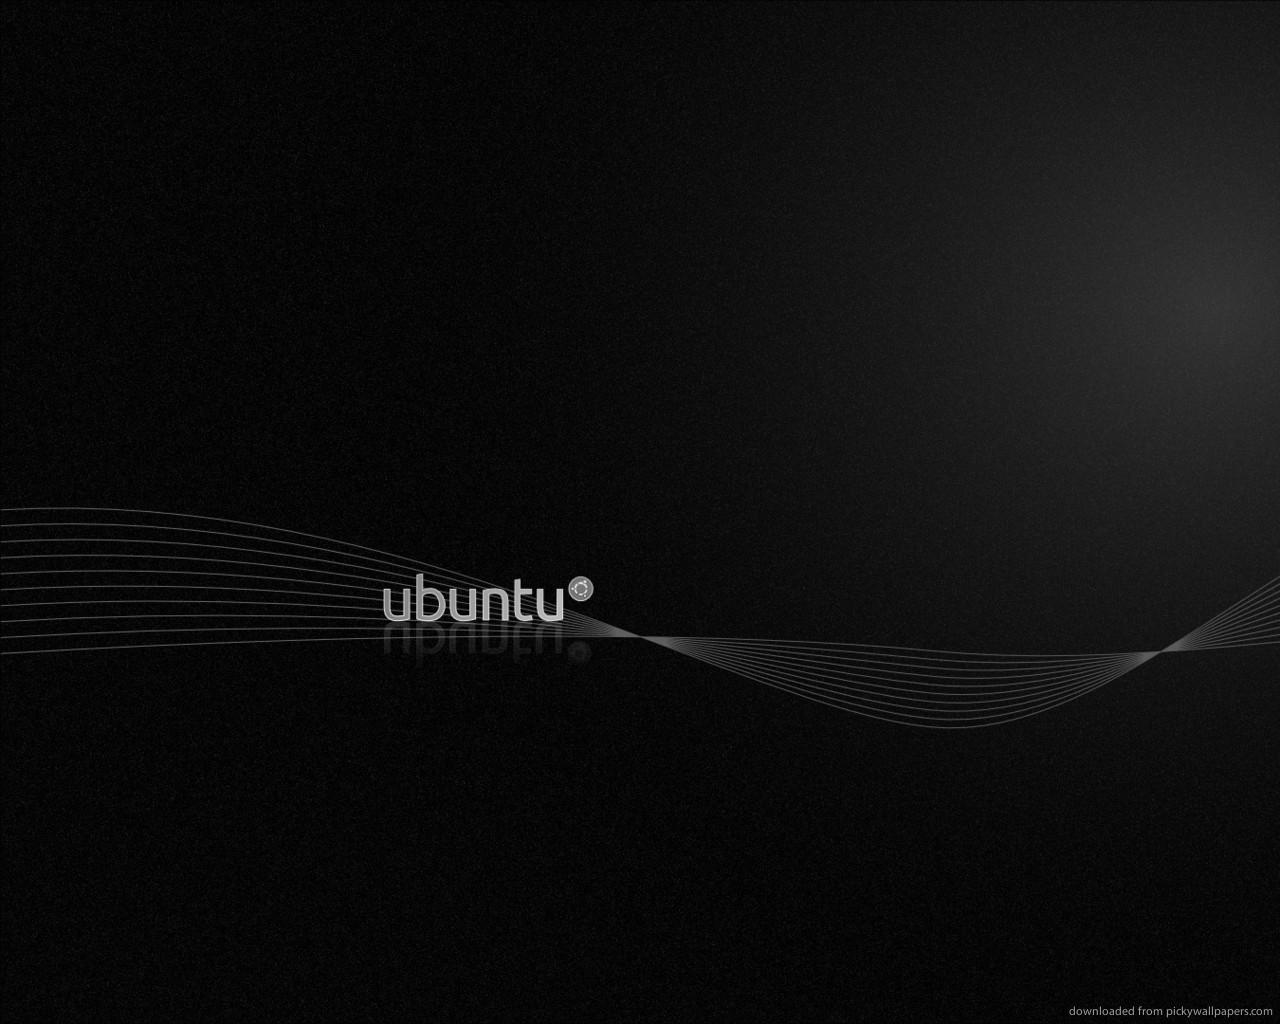 Download 1280x1024 Ubuntu Black Wallpaper 1280x1024